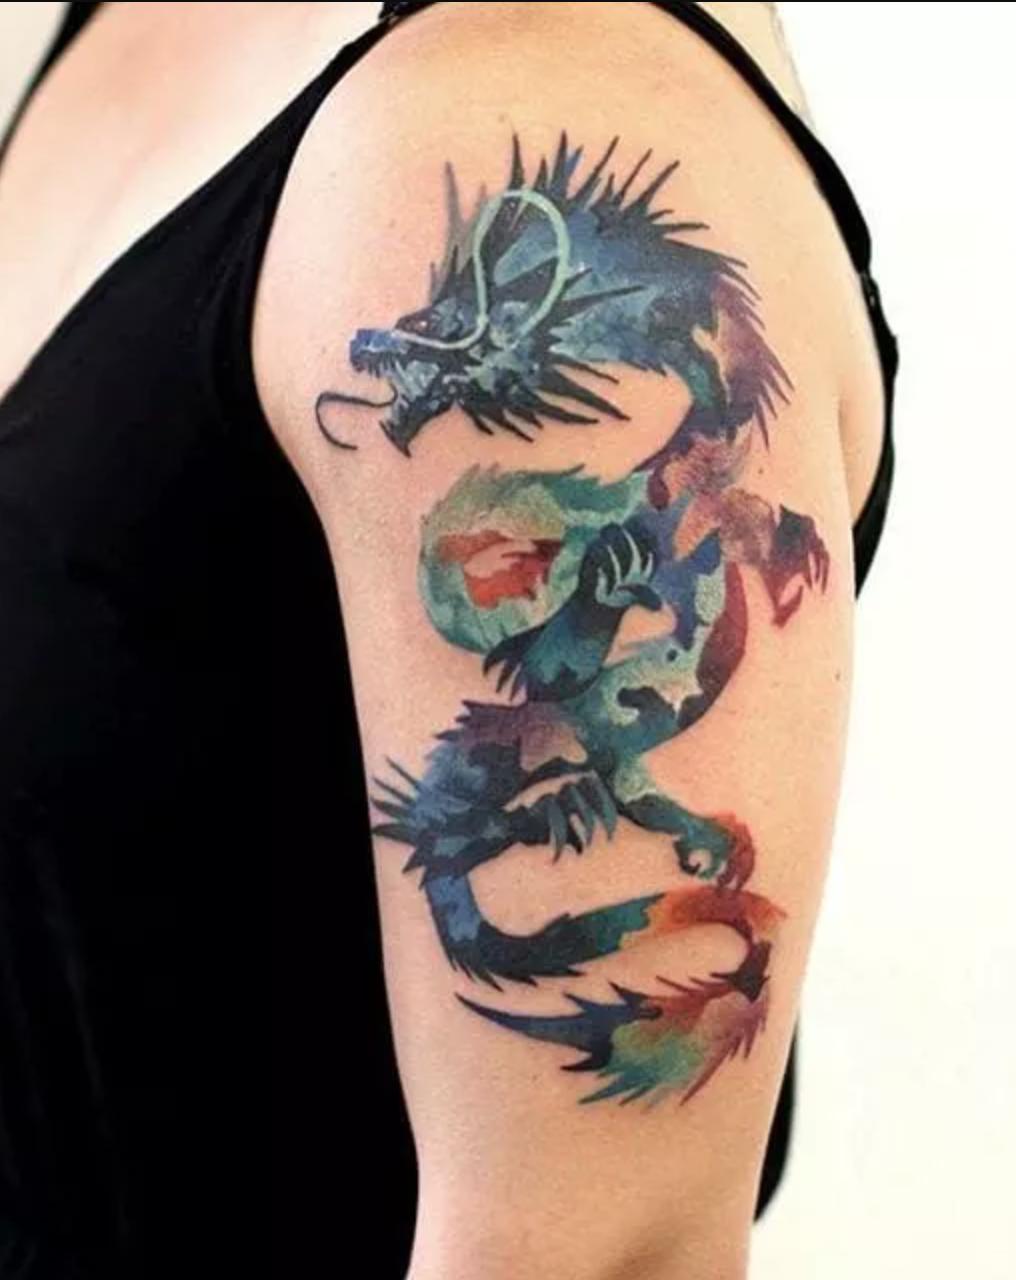 Chinese Zodiac Dragon Tattoos Dragon Tattoo Chinese Dragon Tattoos Watercolor Dragon Tattoo